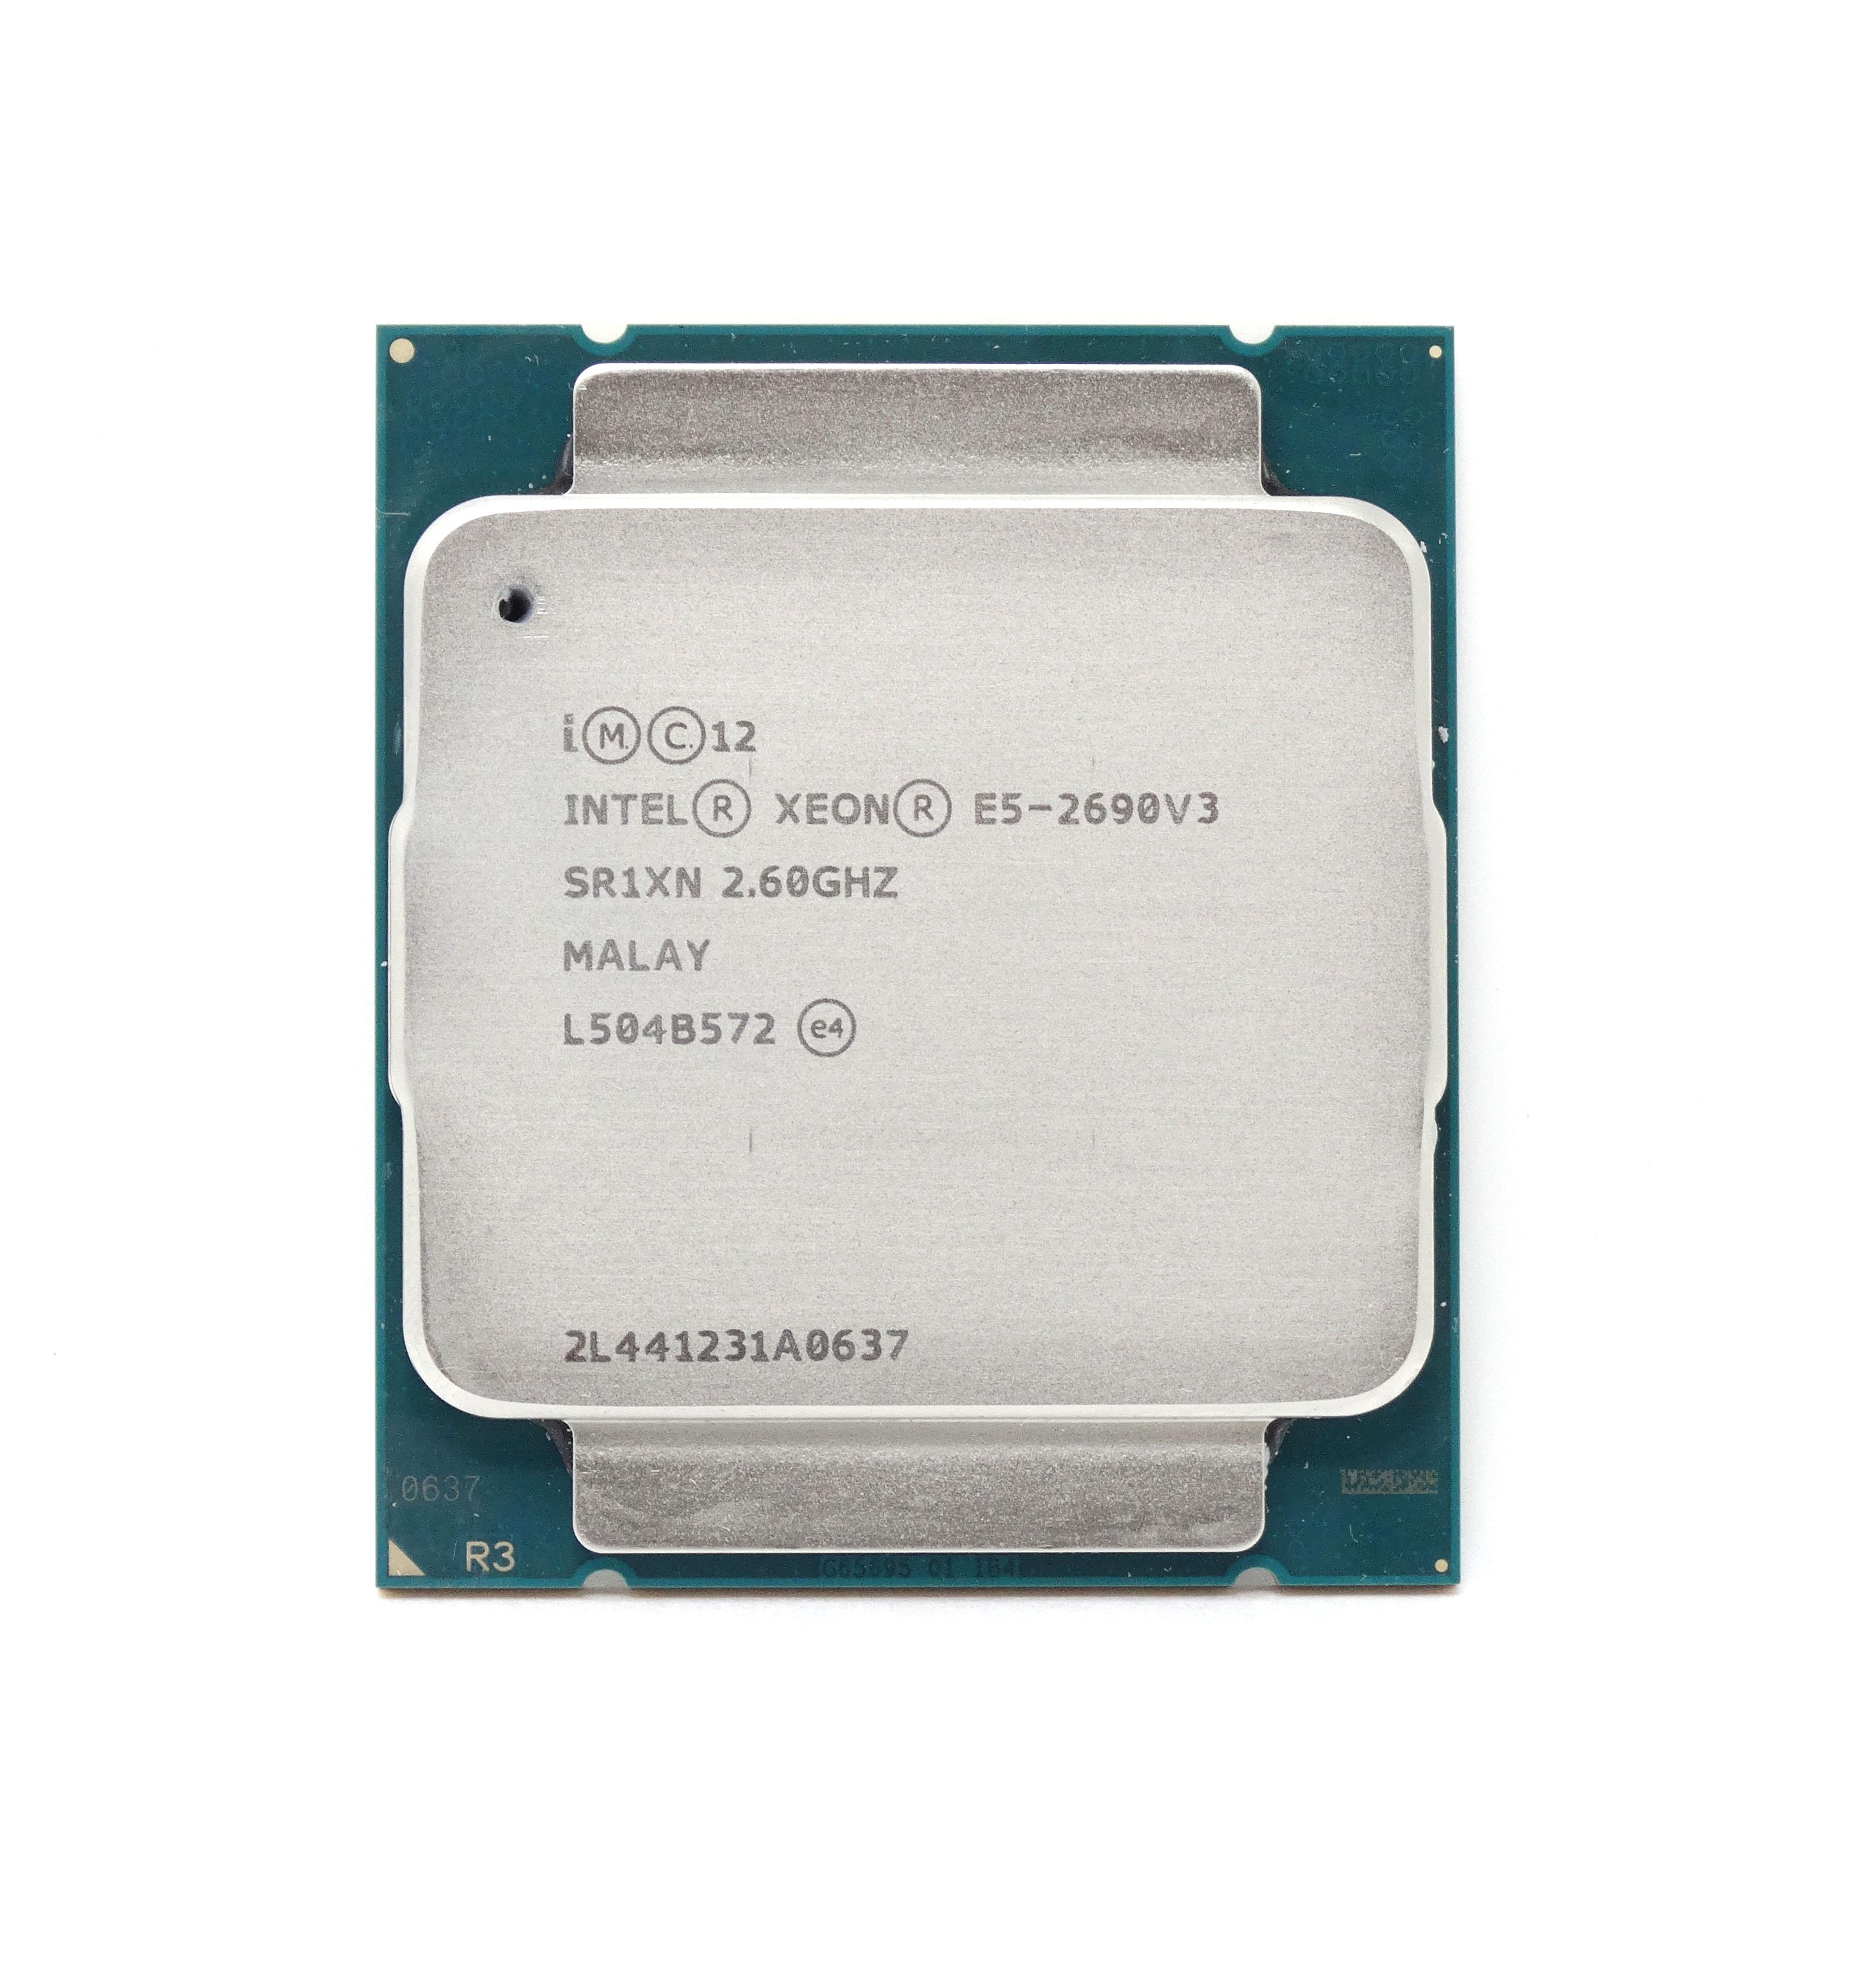 Intel Xeon E5-2690 v3 SR1XN 12 Core 2.6GHz LGA 2011-3 Processor CPU *km